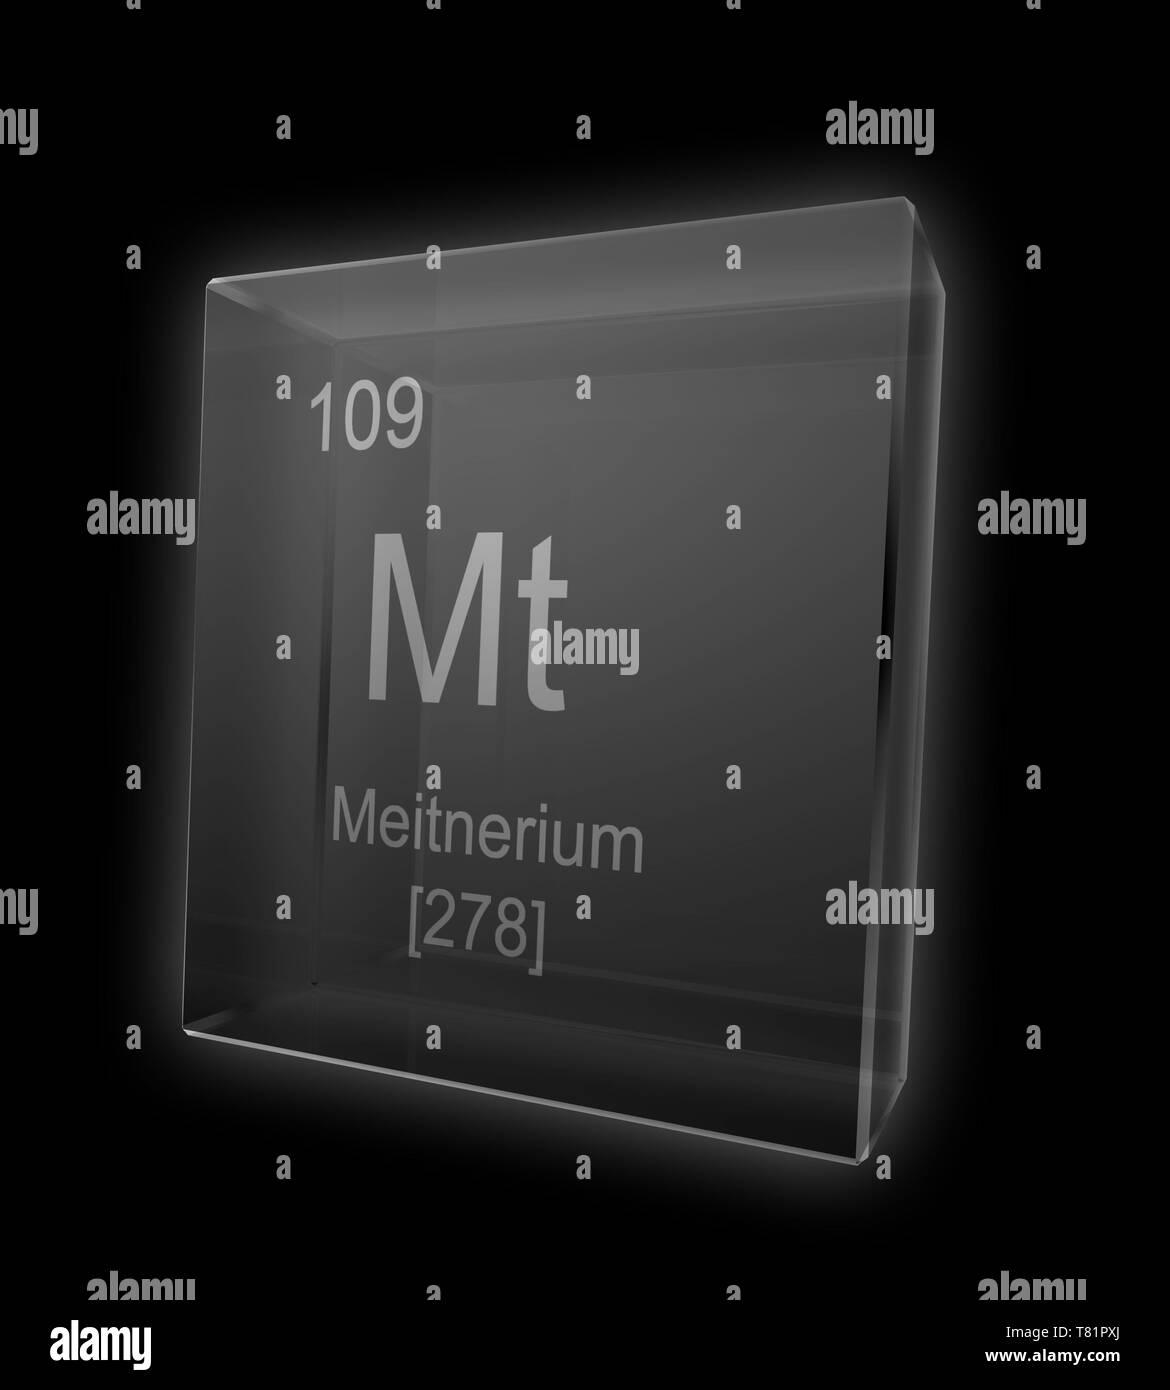 Meitnerium, Chemical Element Symbol, Illustration - Stock Image